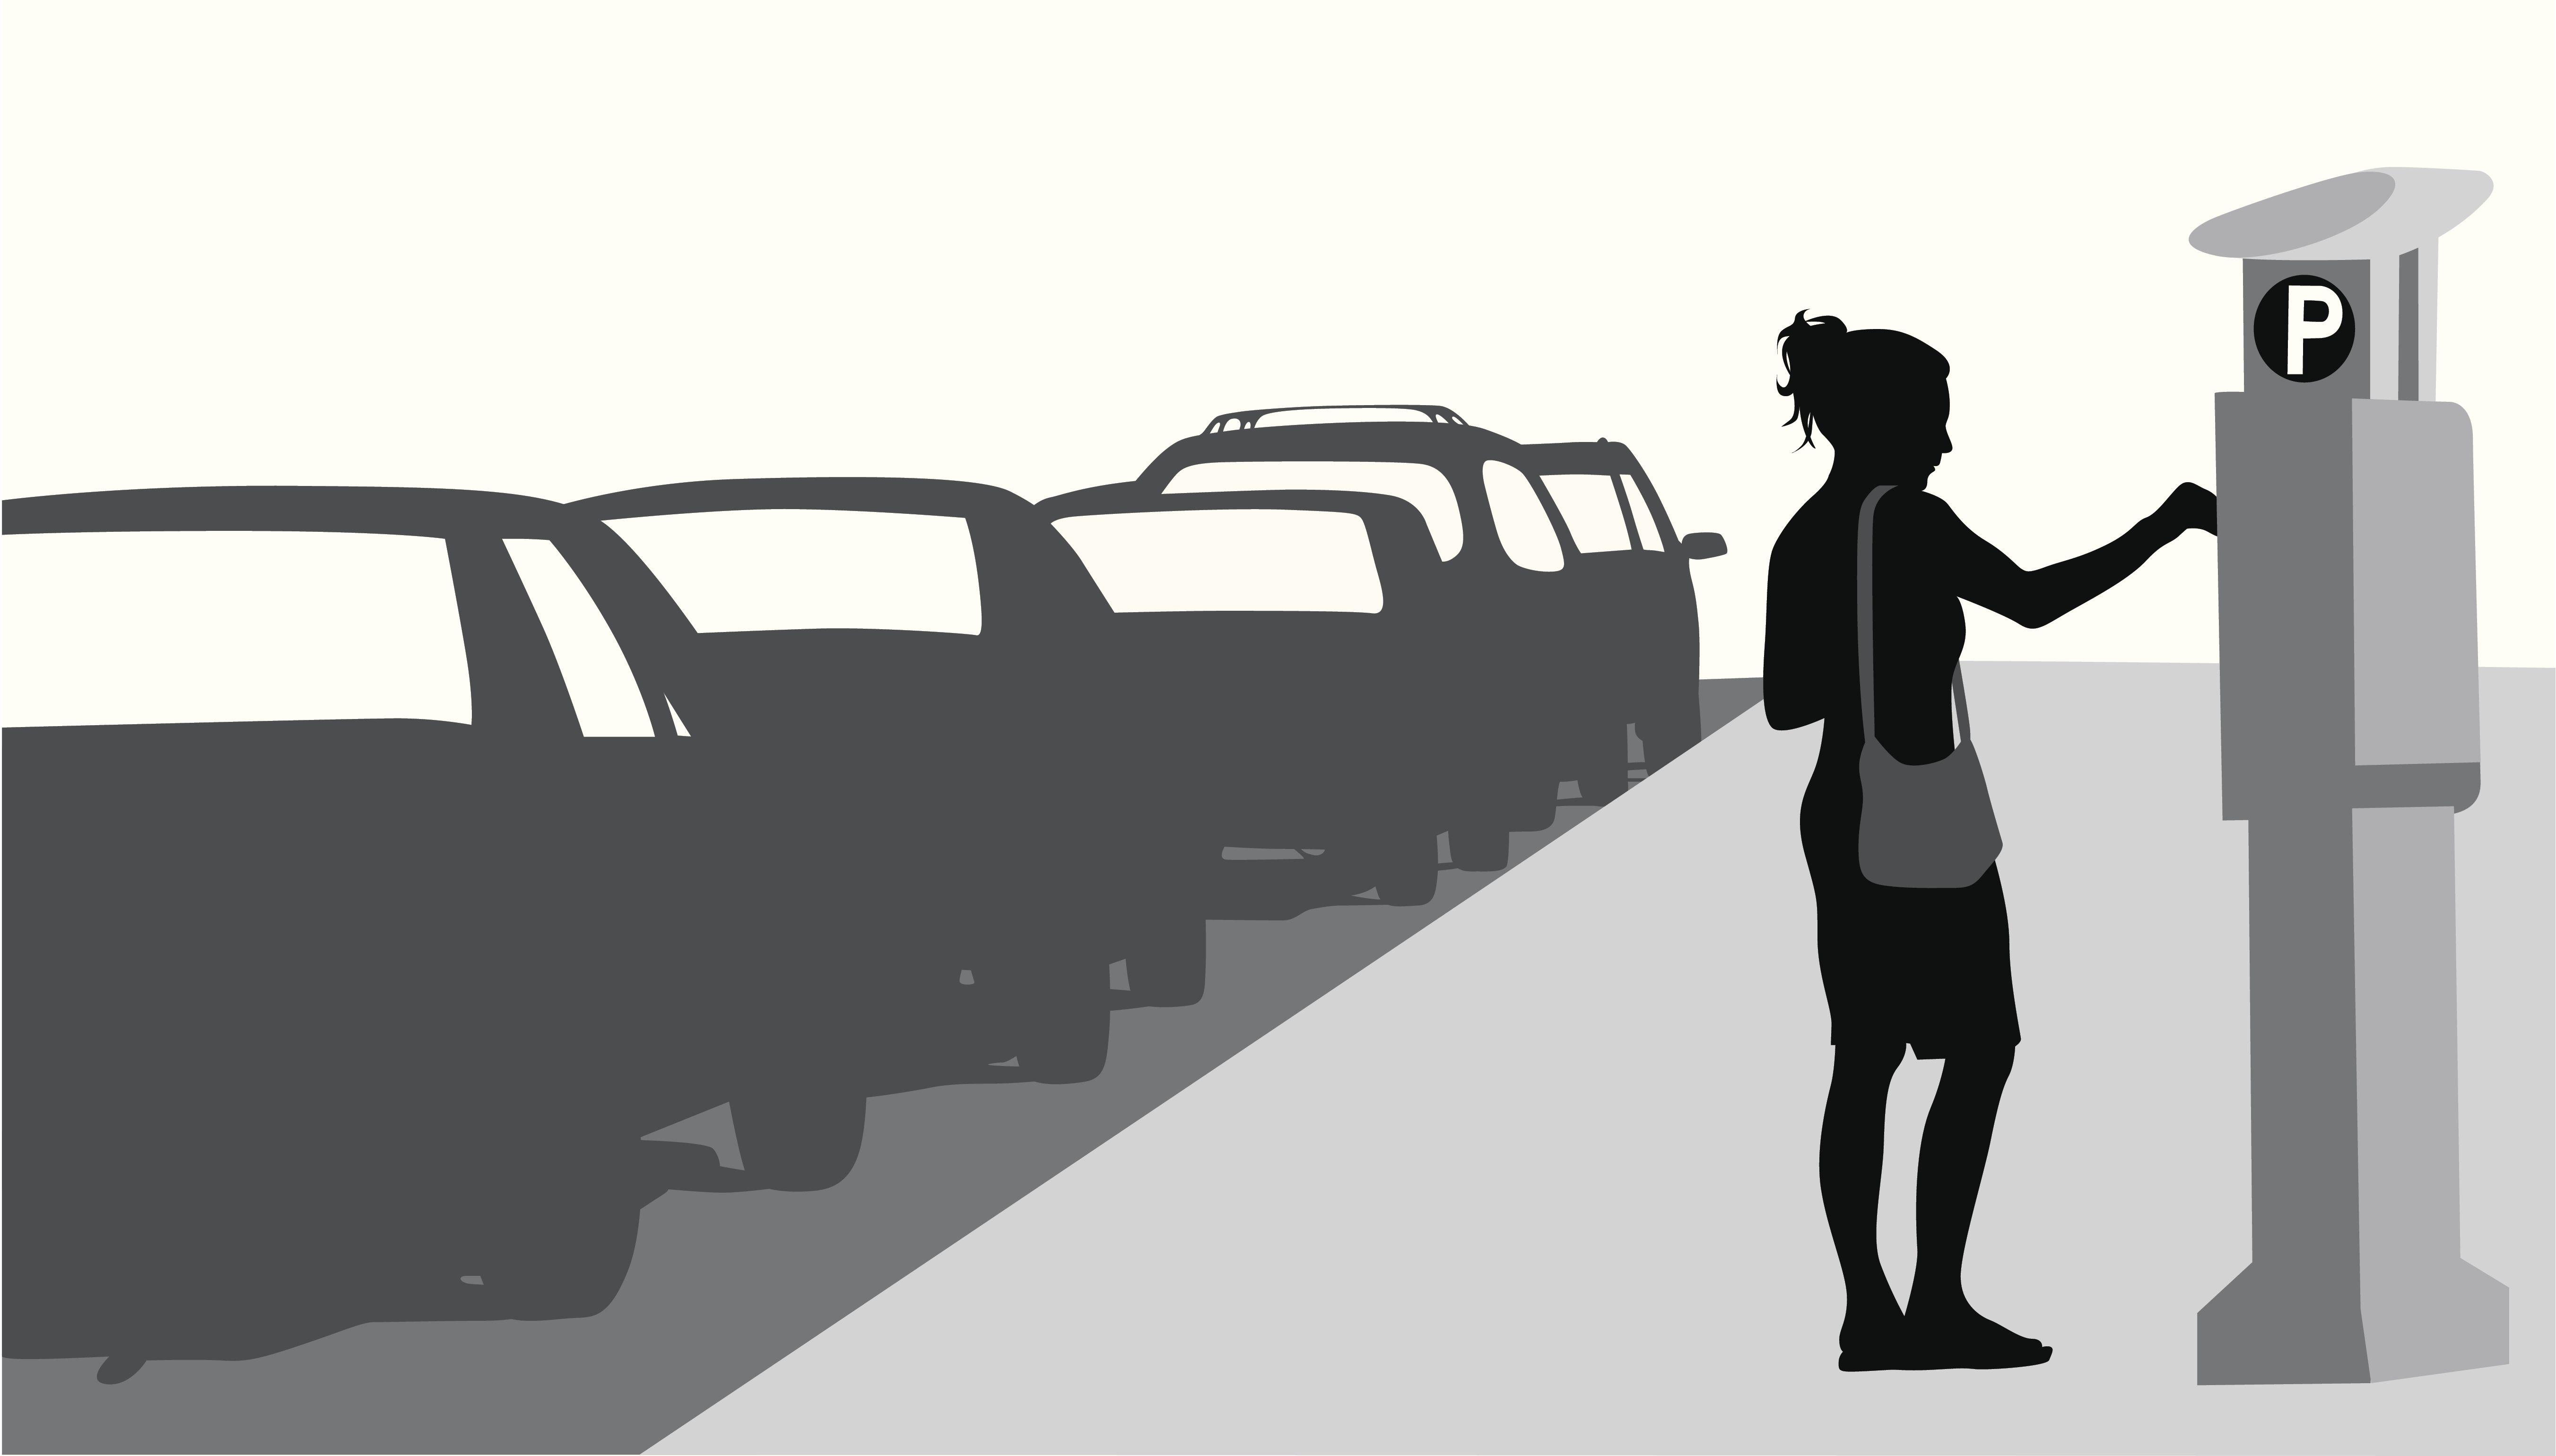 5 ways to master parallel parking